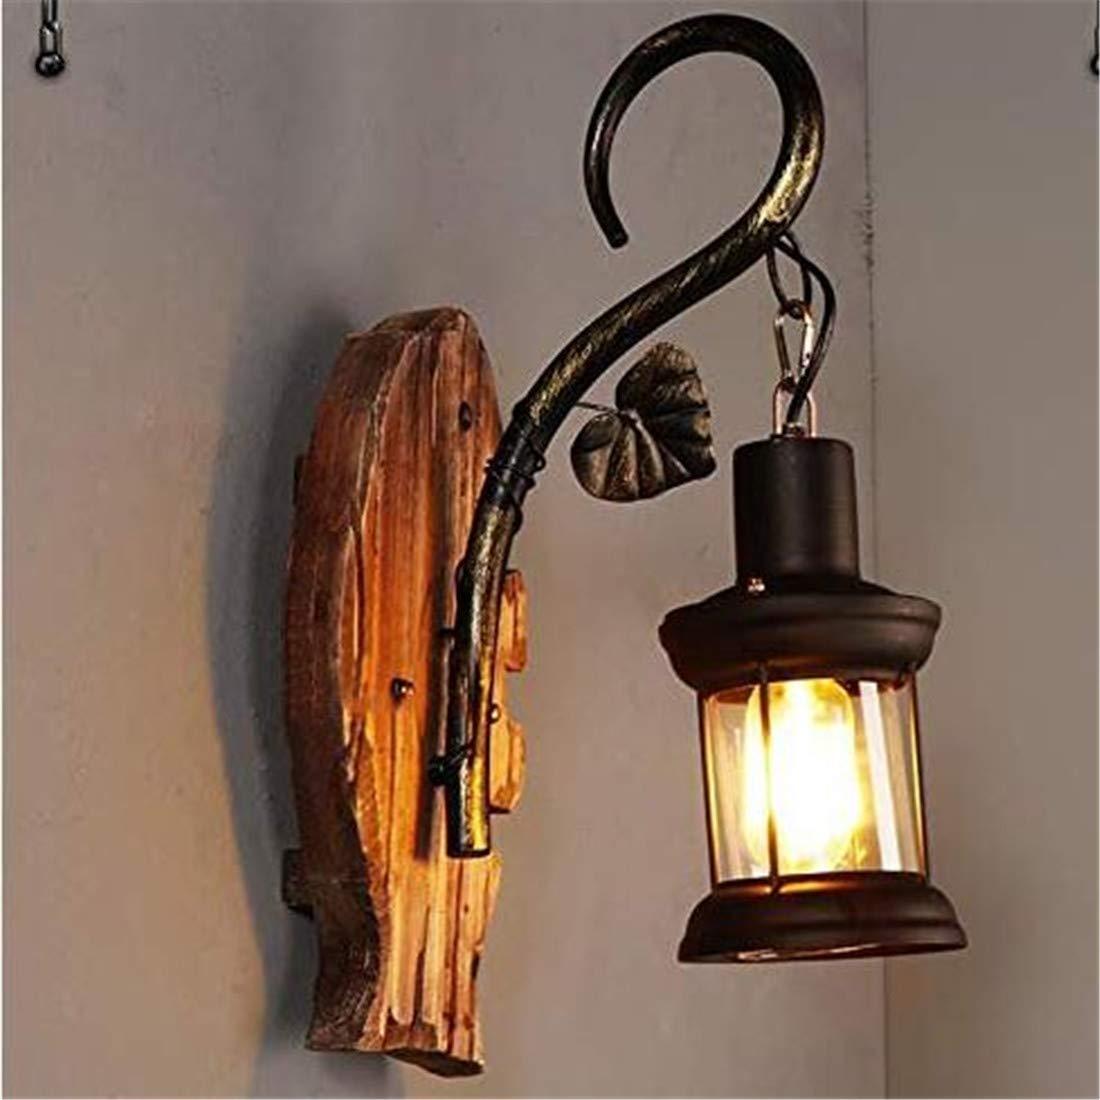 Vintage Chandelierwall Lampe E27 Sockel Industriebeleuchtung Antik Metall Wandleuchte Indoor Home Wandleuchte Bar, Restaurant, Café, Club Retro Dekorative Lampen [Energieklasse A]